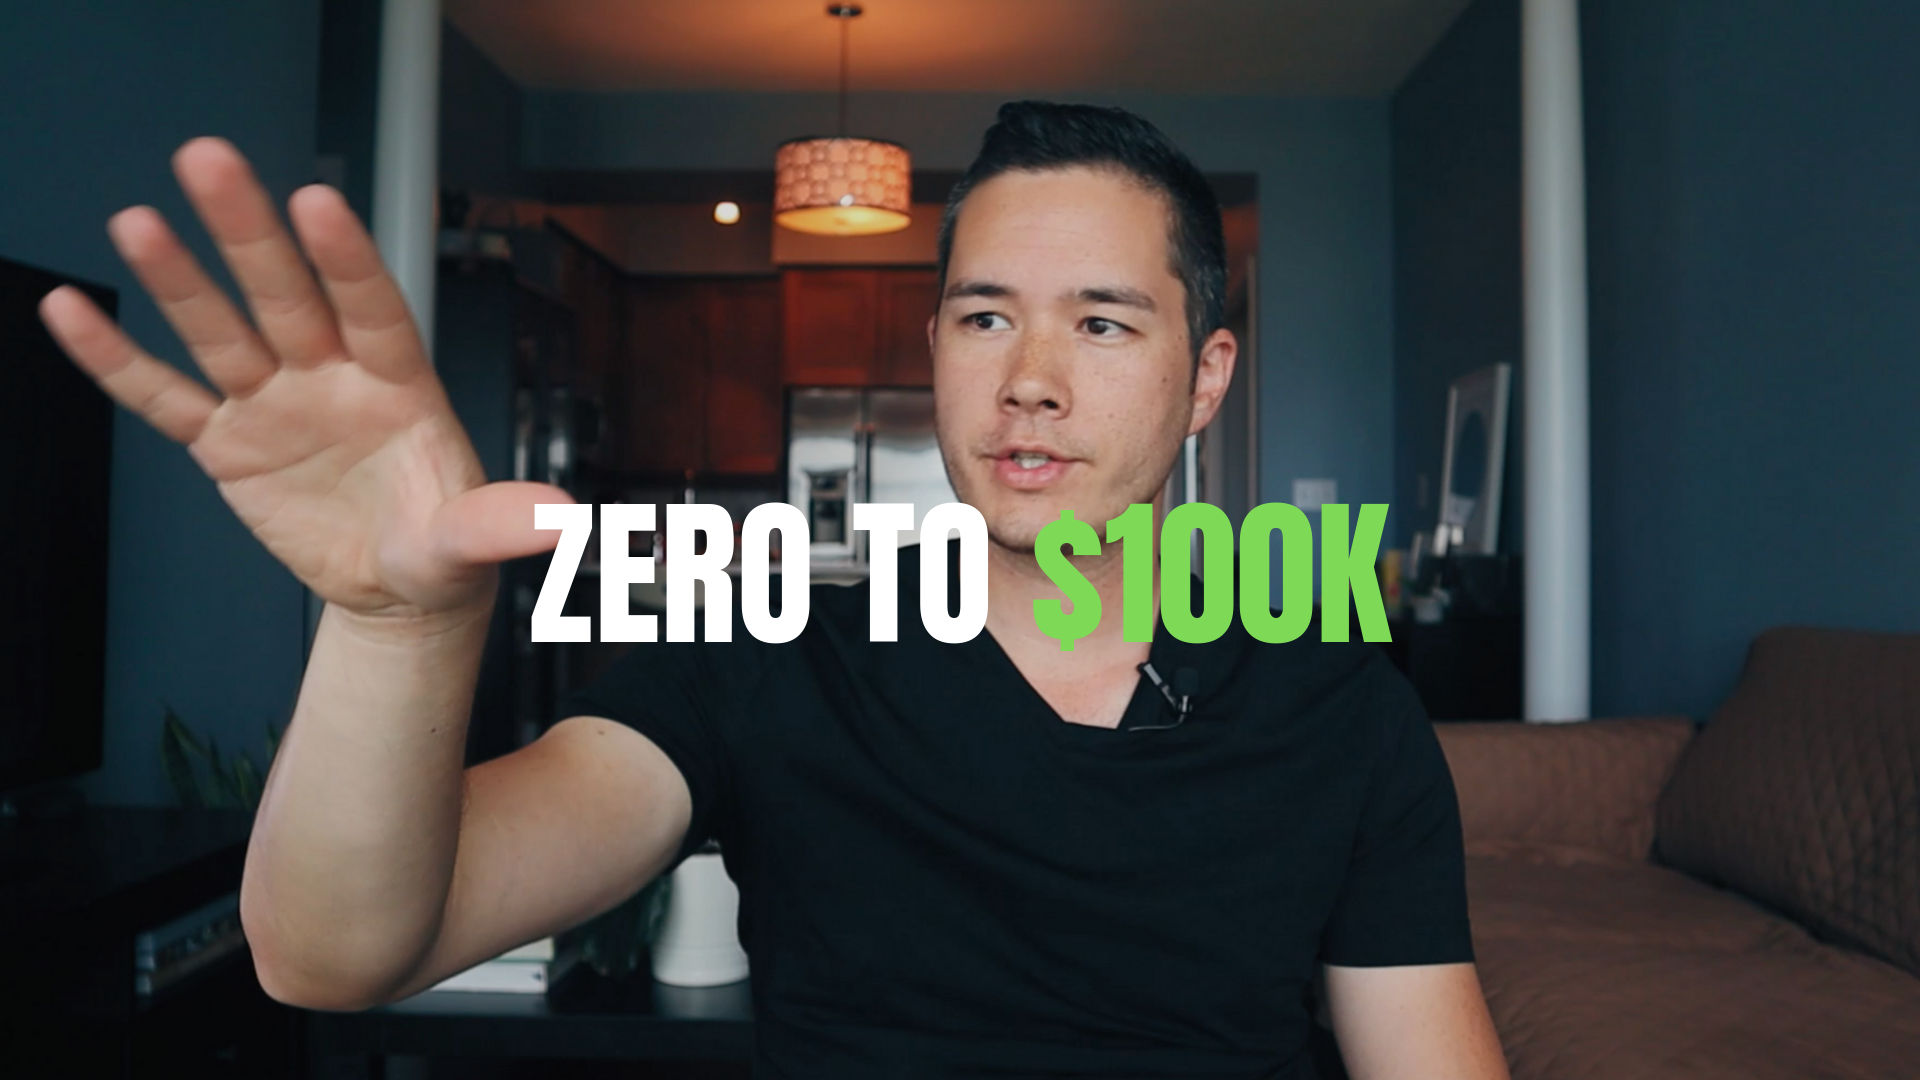 Zero to 100k (1).png